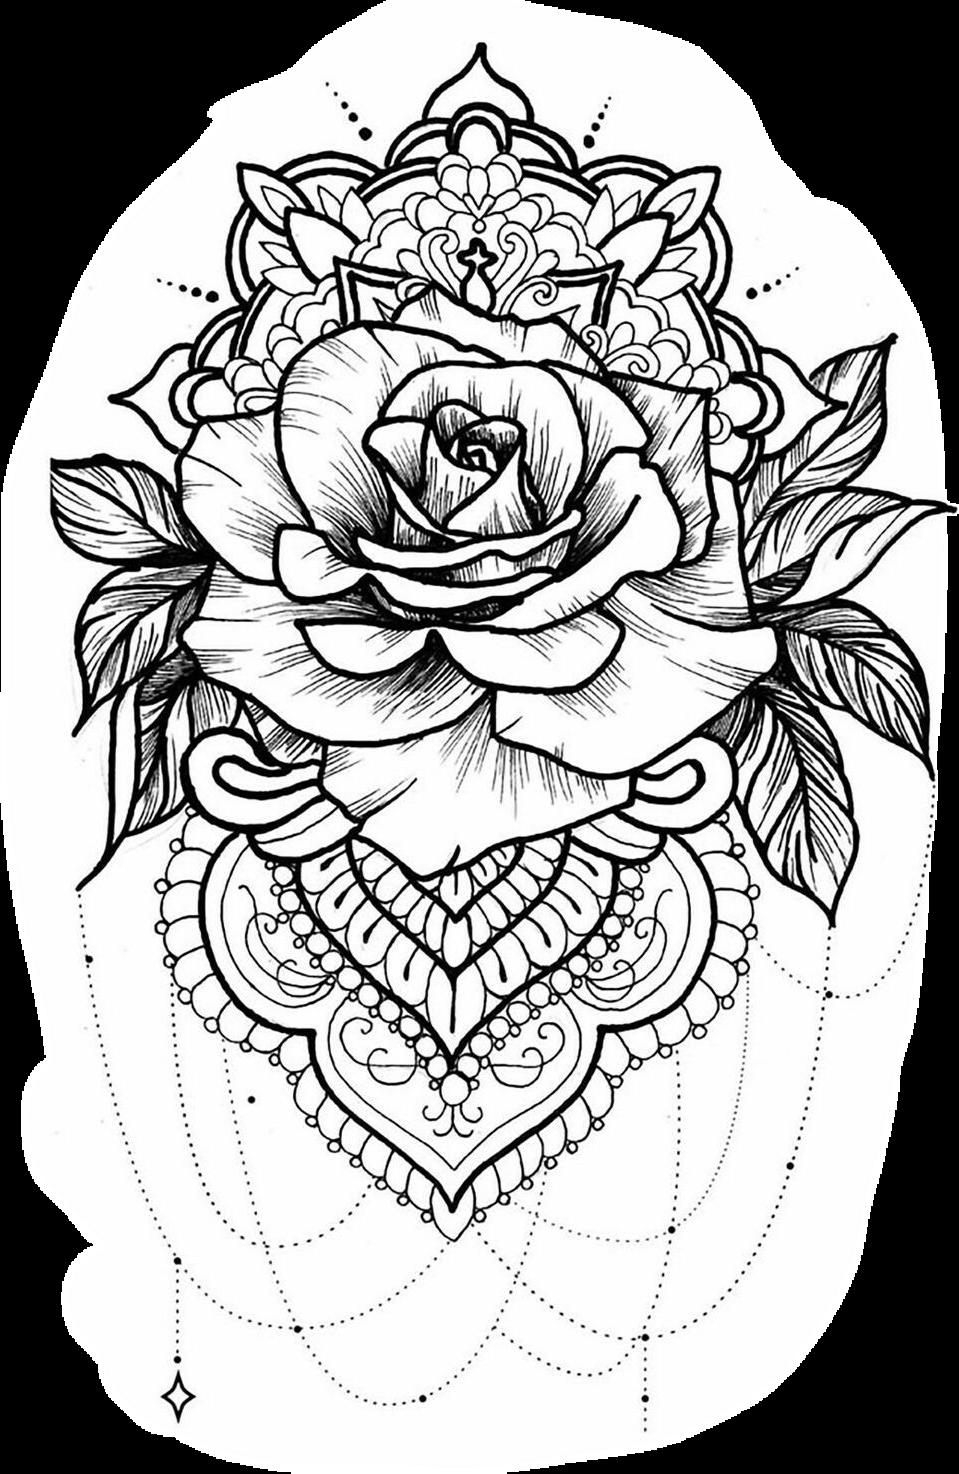 Tattoo Sketch Rose Tattoo Ideen Tattoo Ideen Tatowierungen